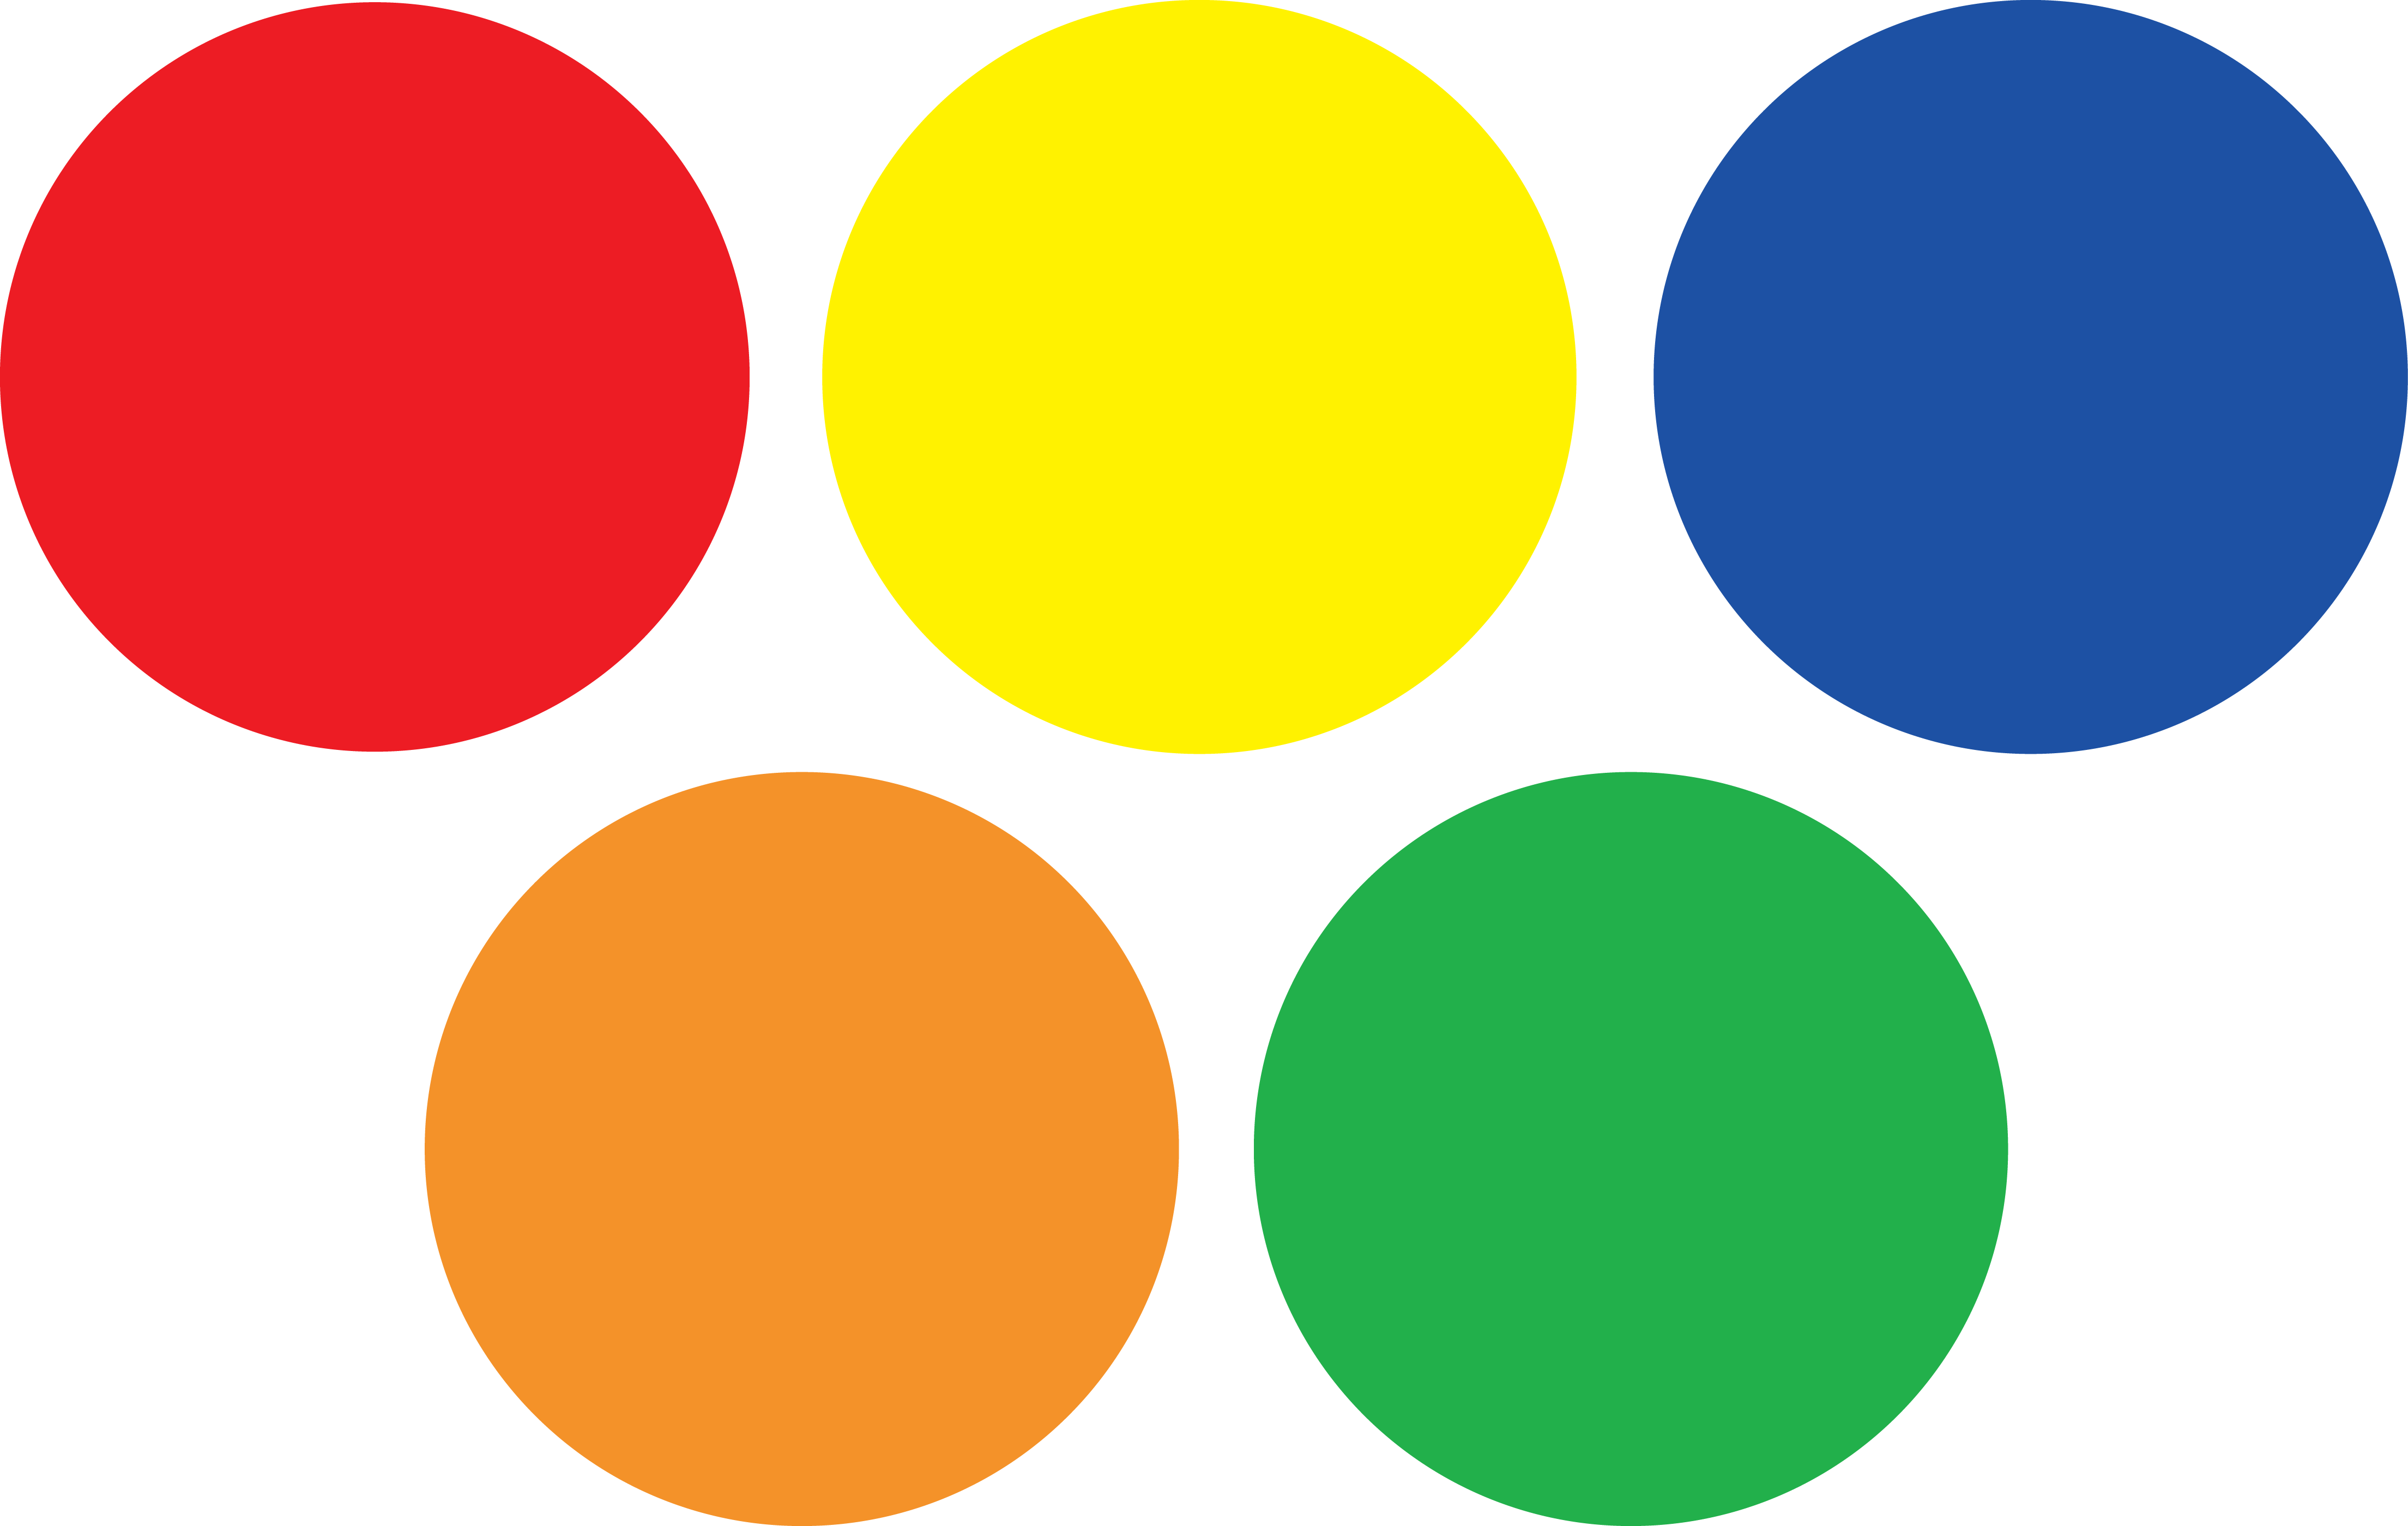 Clipart Circle Colored Clipart Circle Colored Transparent